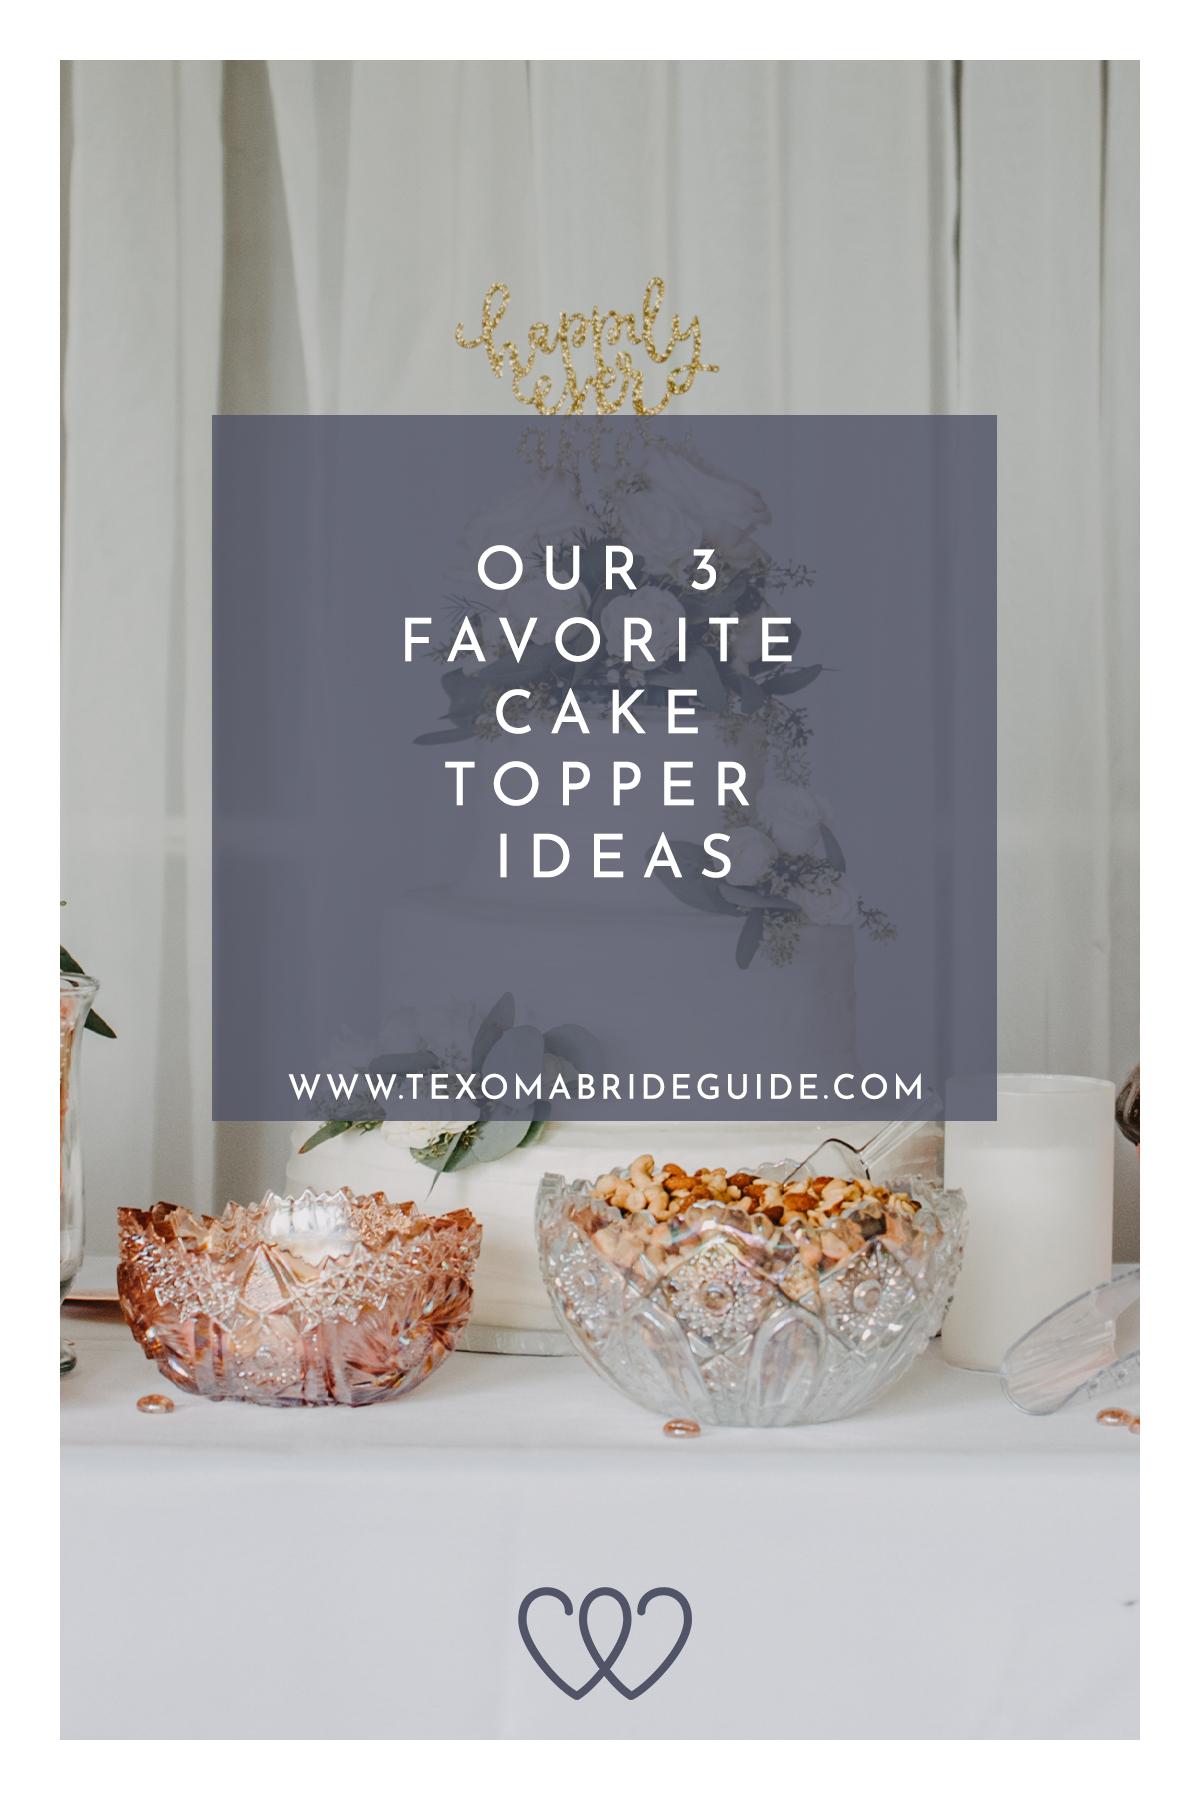 Our 3 Favorite Cake Topper Ideas | Texoma Bride Guide Blog